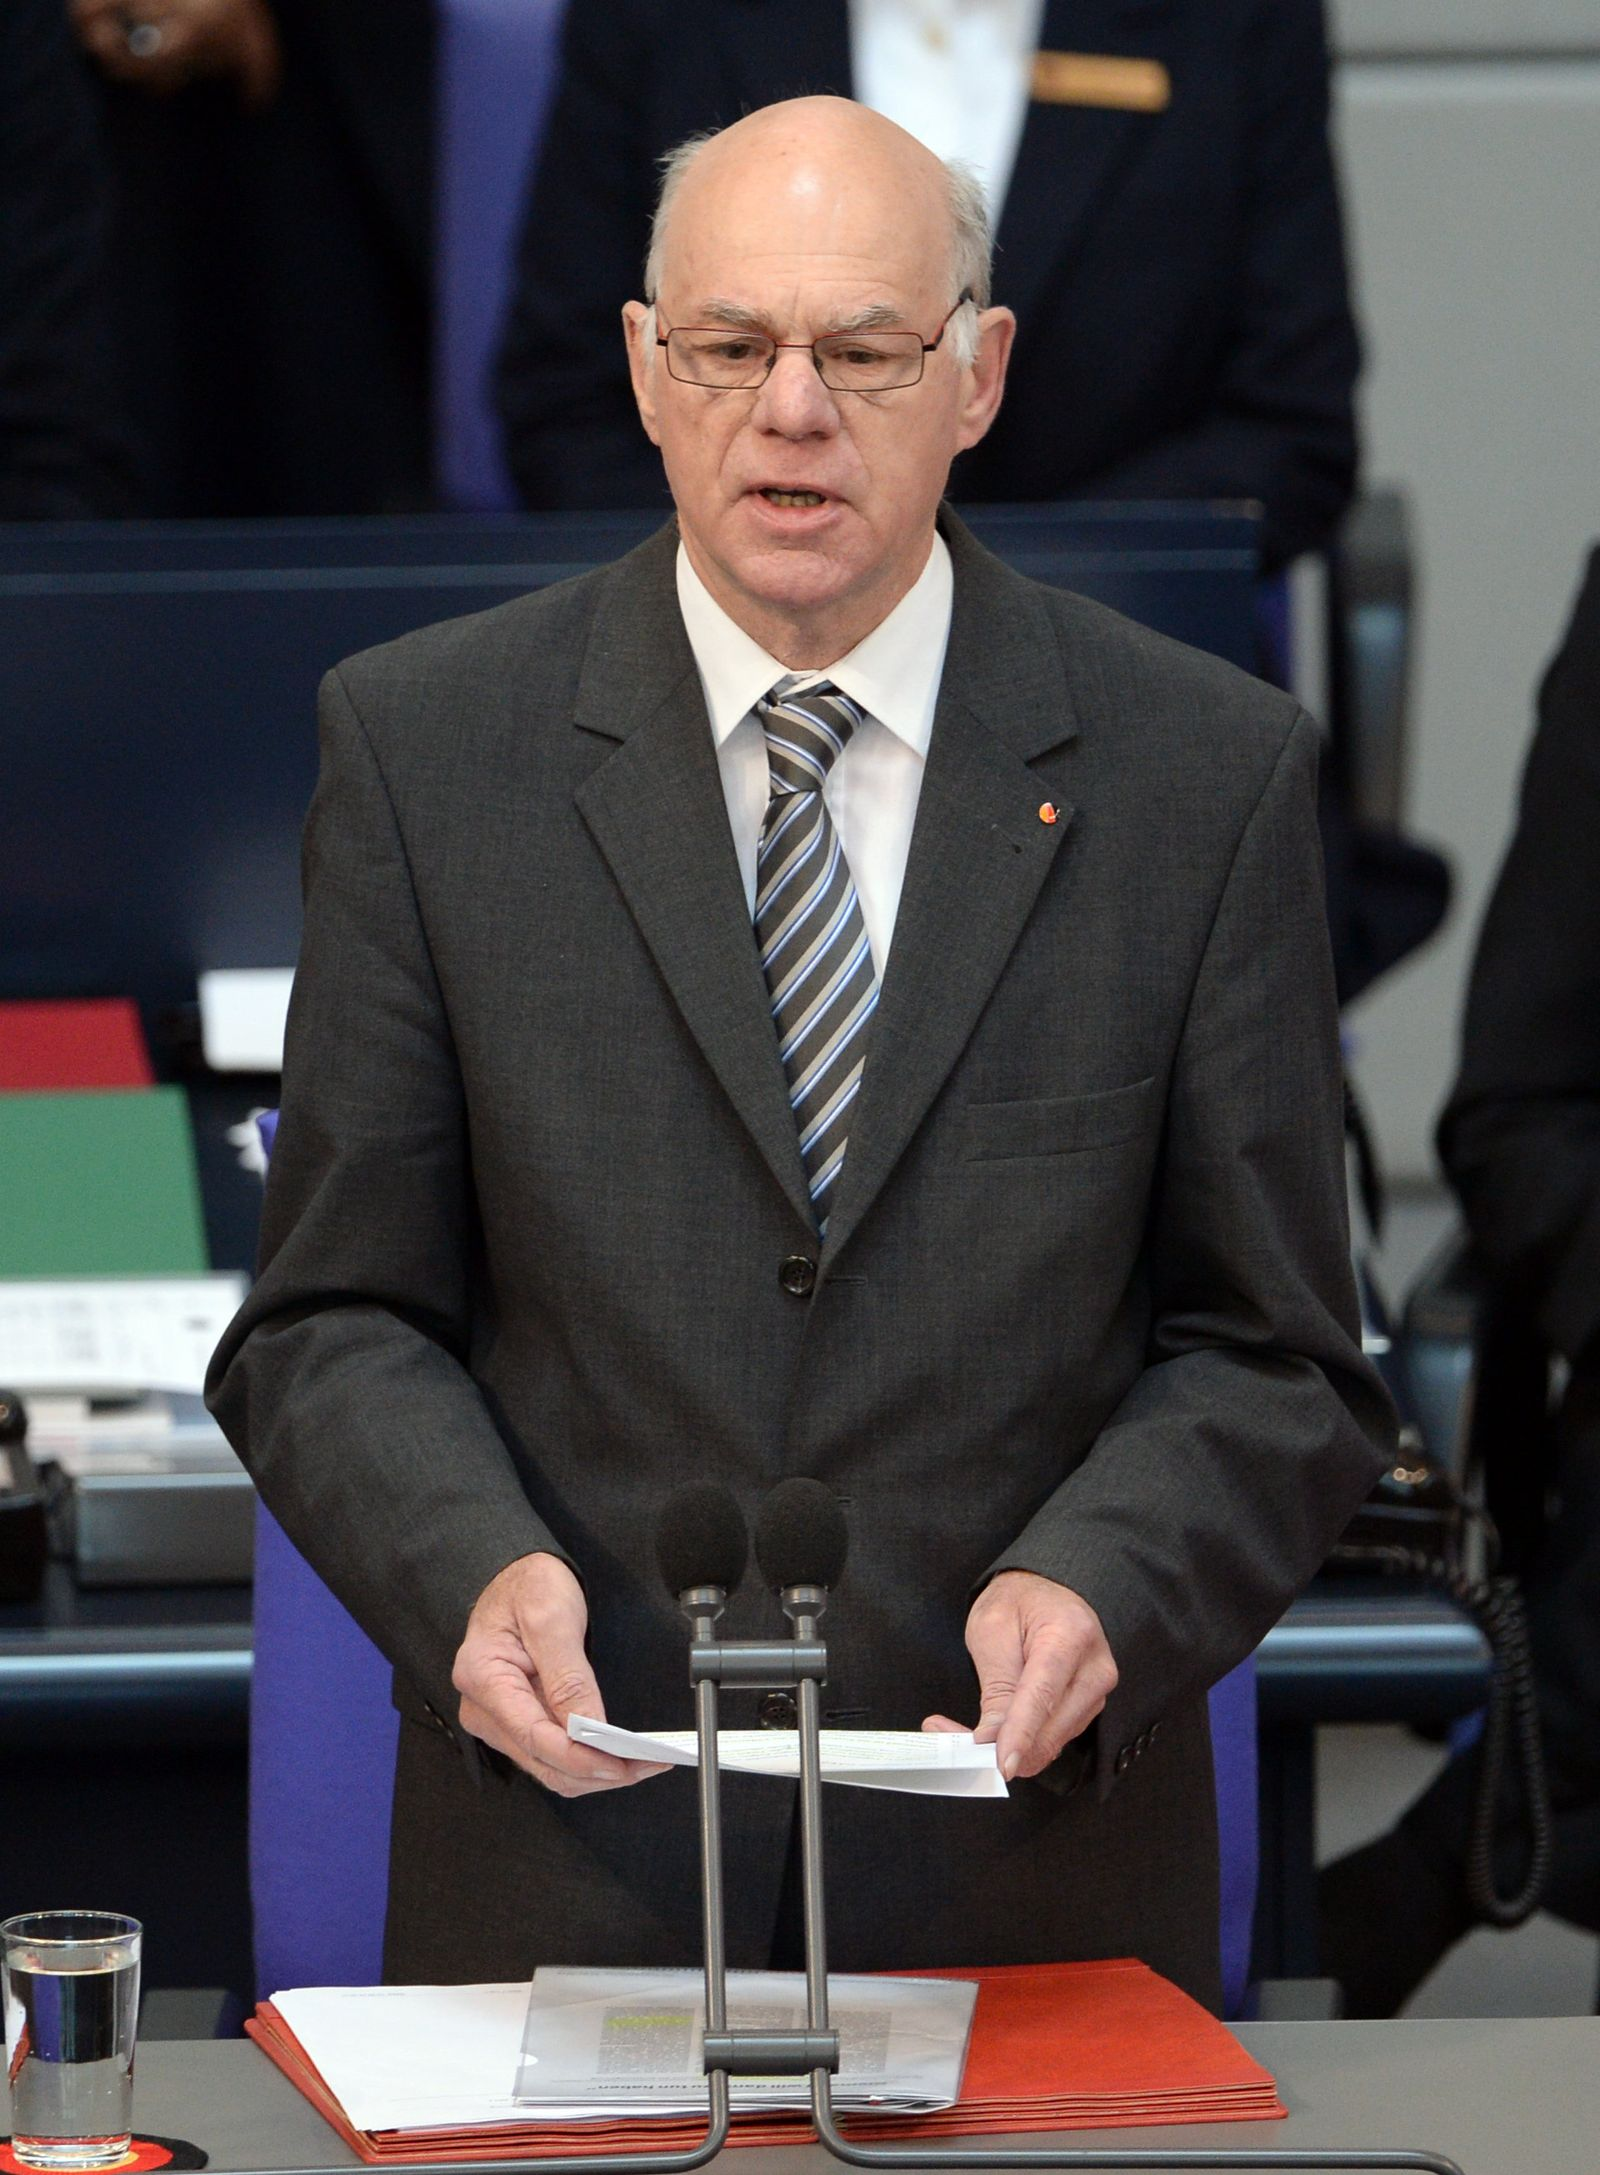 Bundestag/ Norbert Lammert